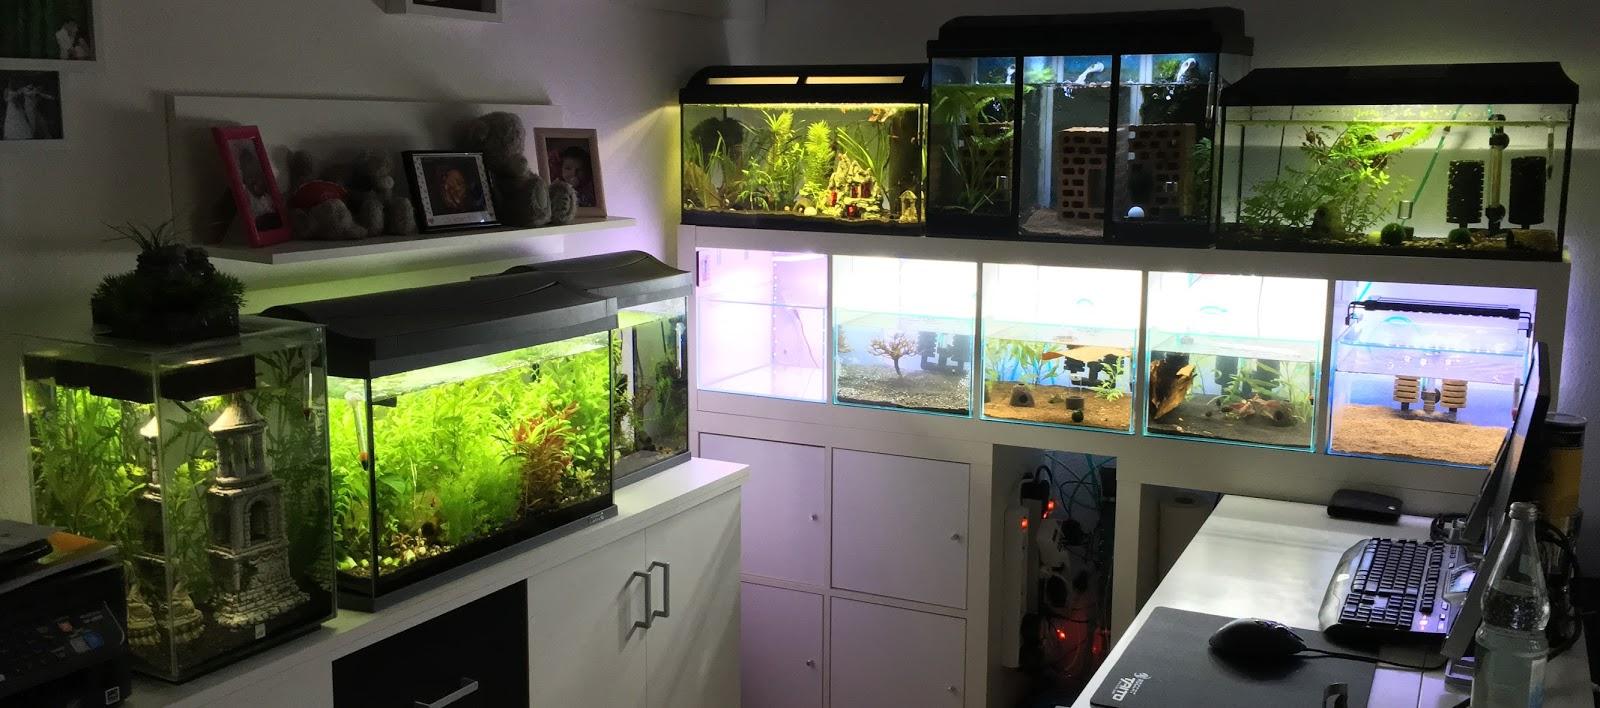 Knuts Garnelenblog: Aufbau der Aquarienanlage